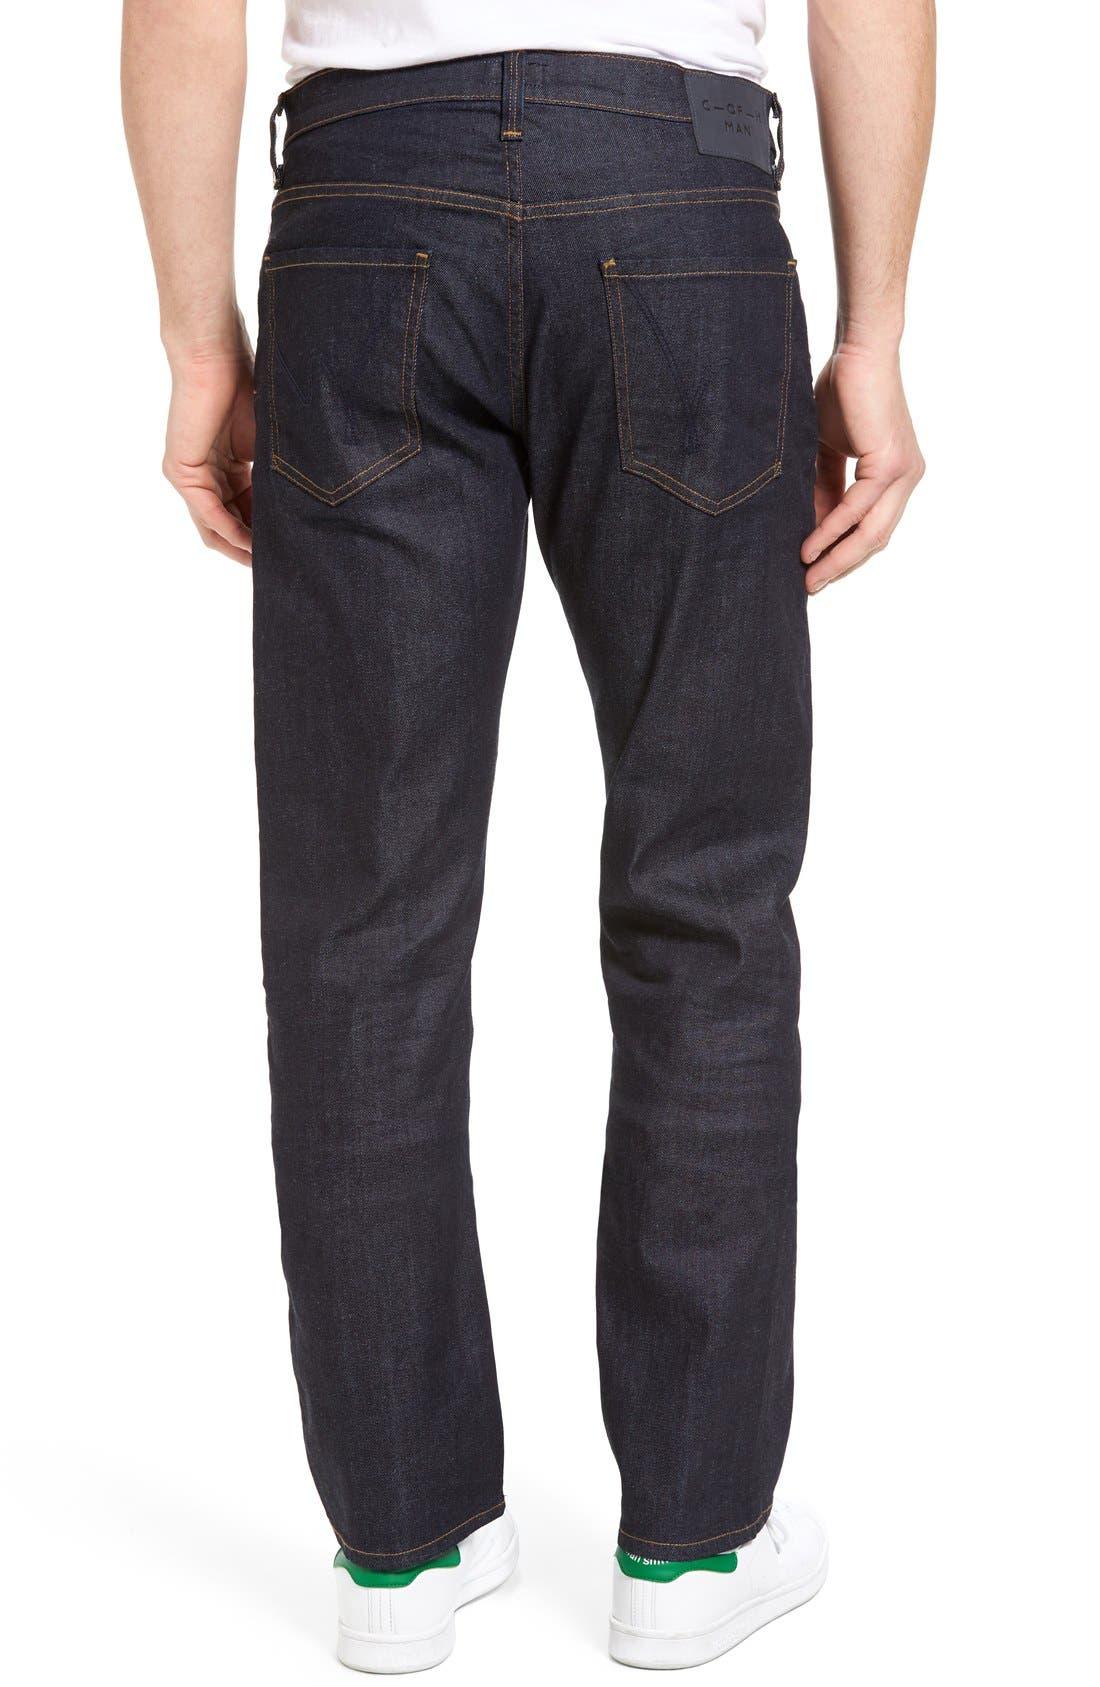 Sid Classic Straight Leg Jeans,                             Alternate thumbnail 8, color,                             LAFAYETTE